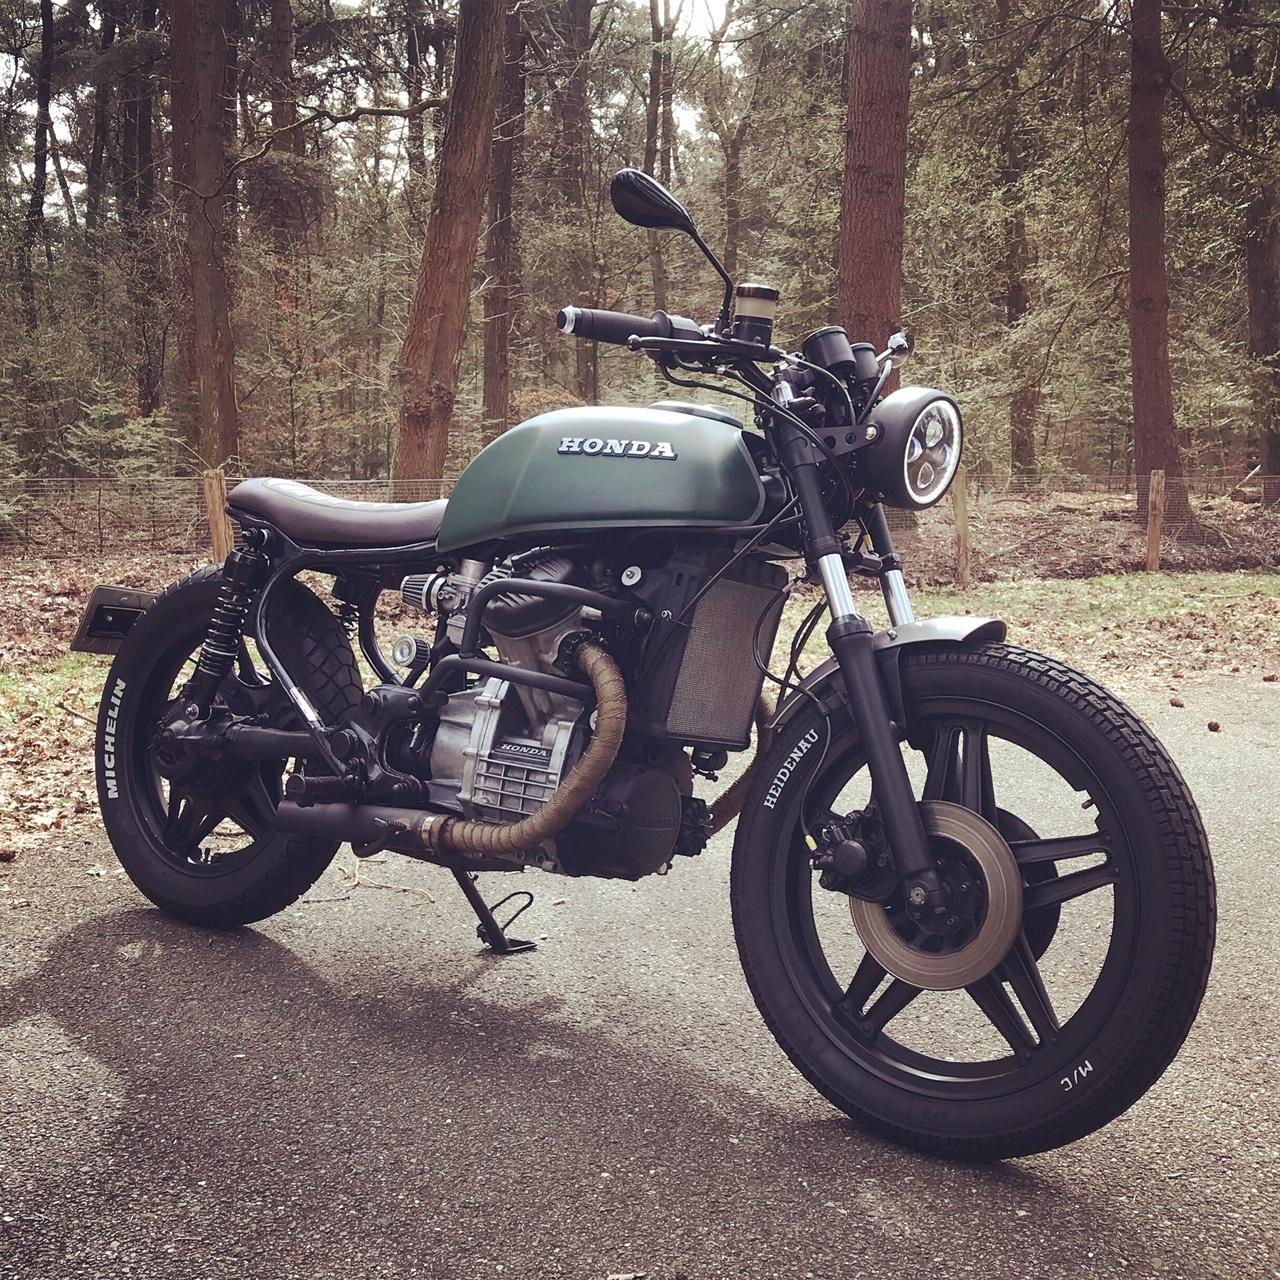 Tweedehands betaalbare custom bikes